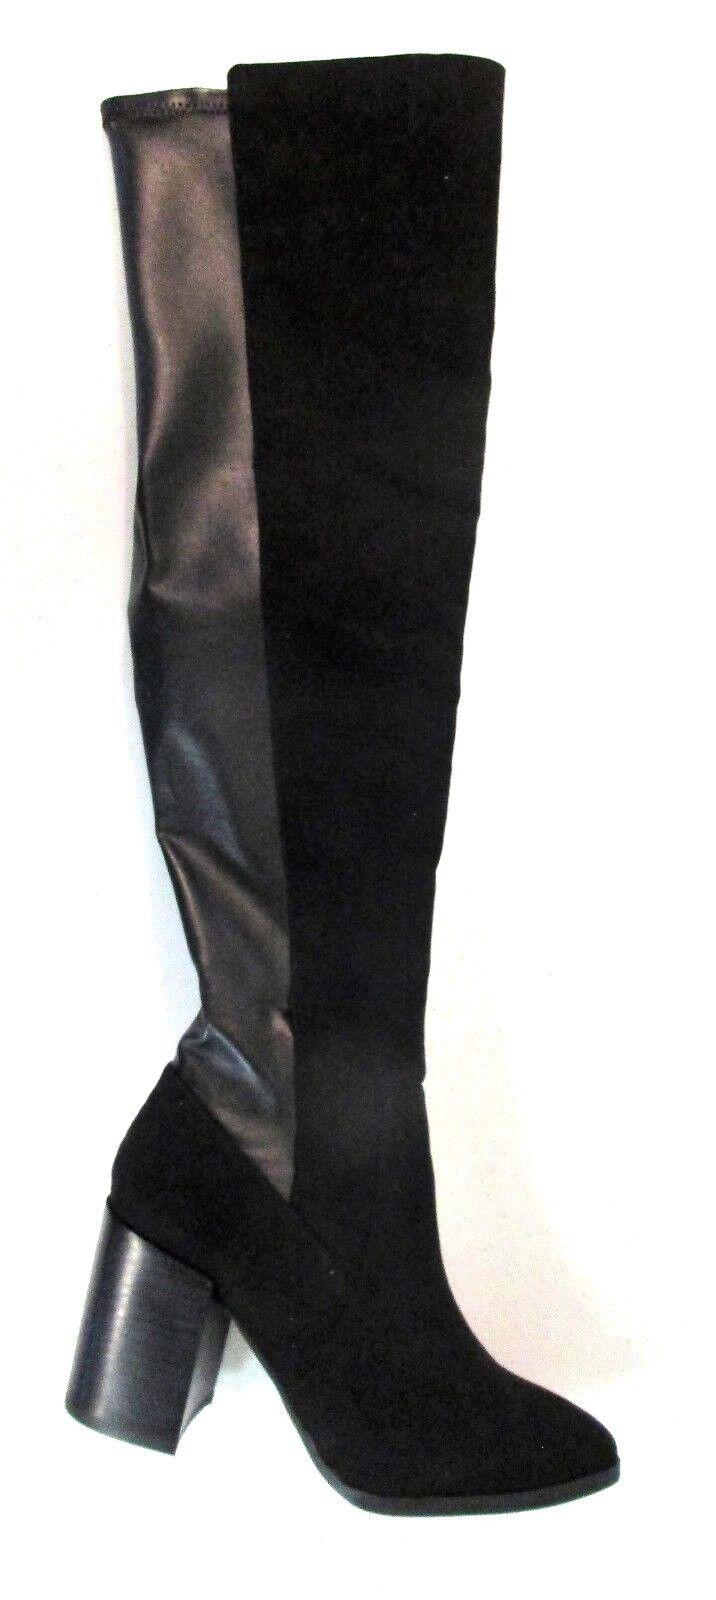 Report Jetsan Tall Shaft Women's Over Knee Engineer Boots 6 M 5499